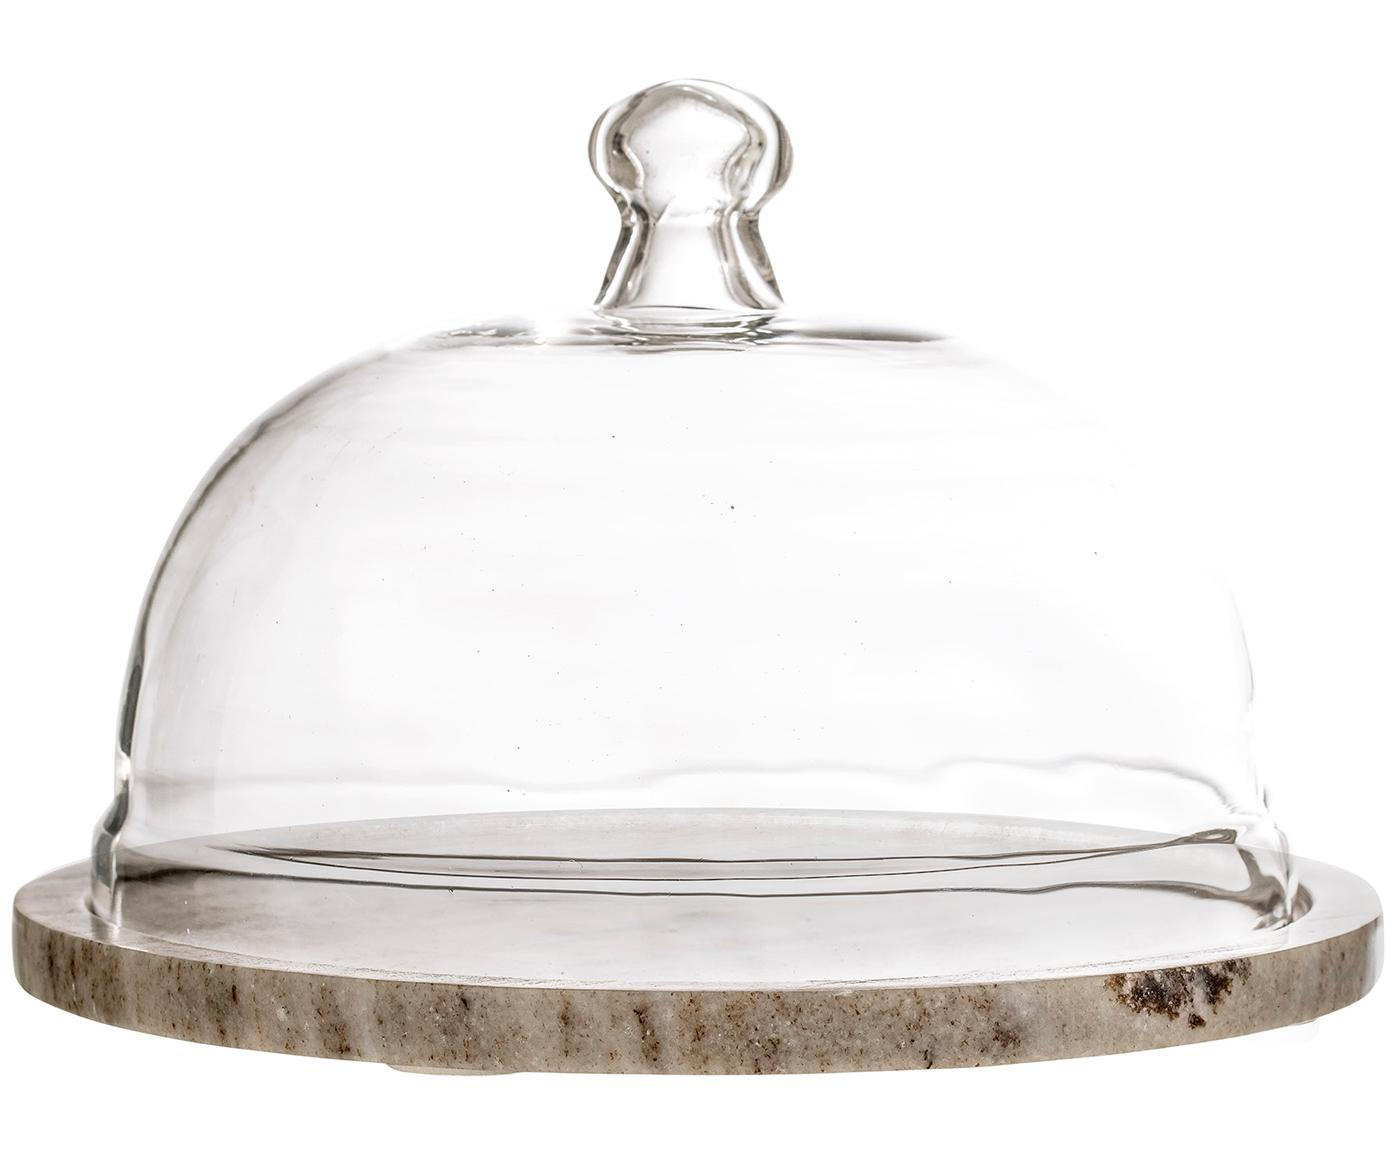 Marmor-Käseglocke Cheese, Glocke: Glas, Platte: Marmor, Beige, Transparent, Ø 25 x H 14 cm